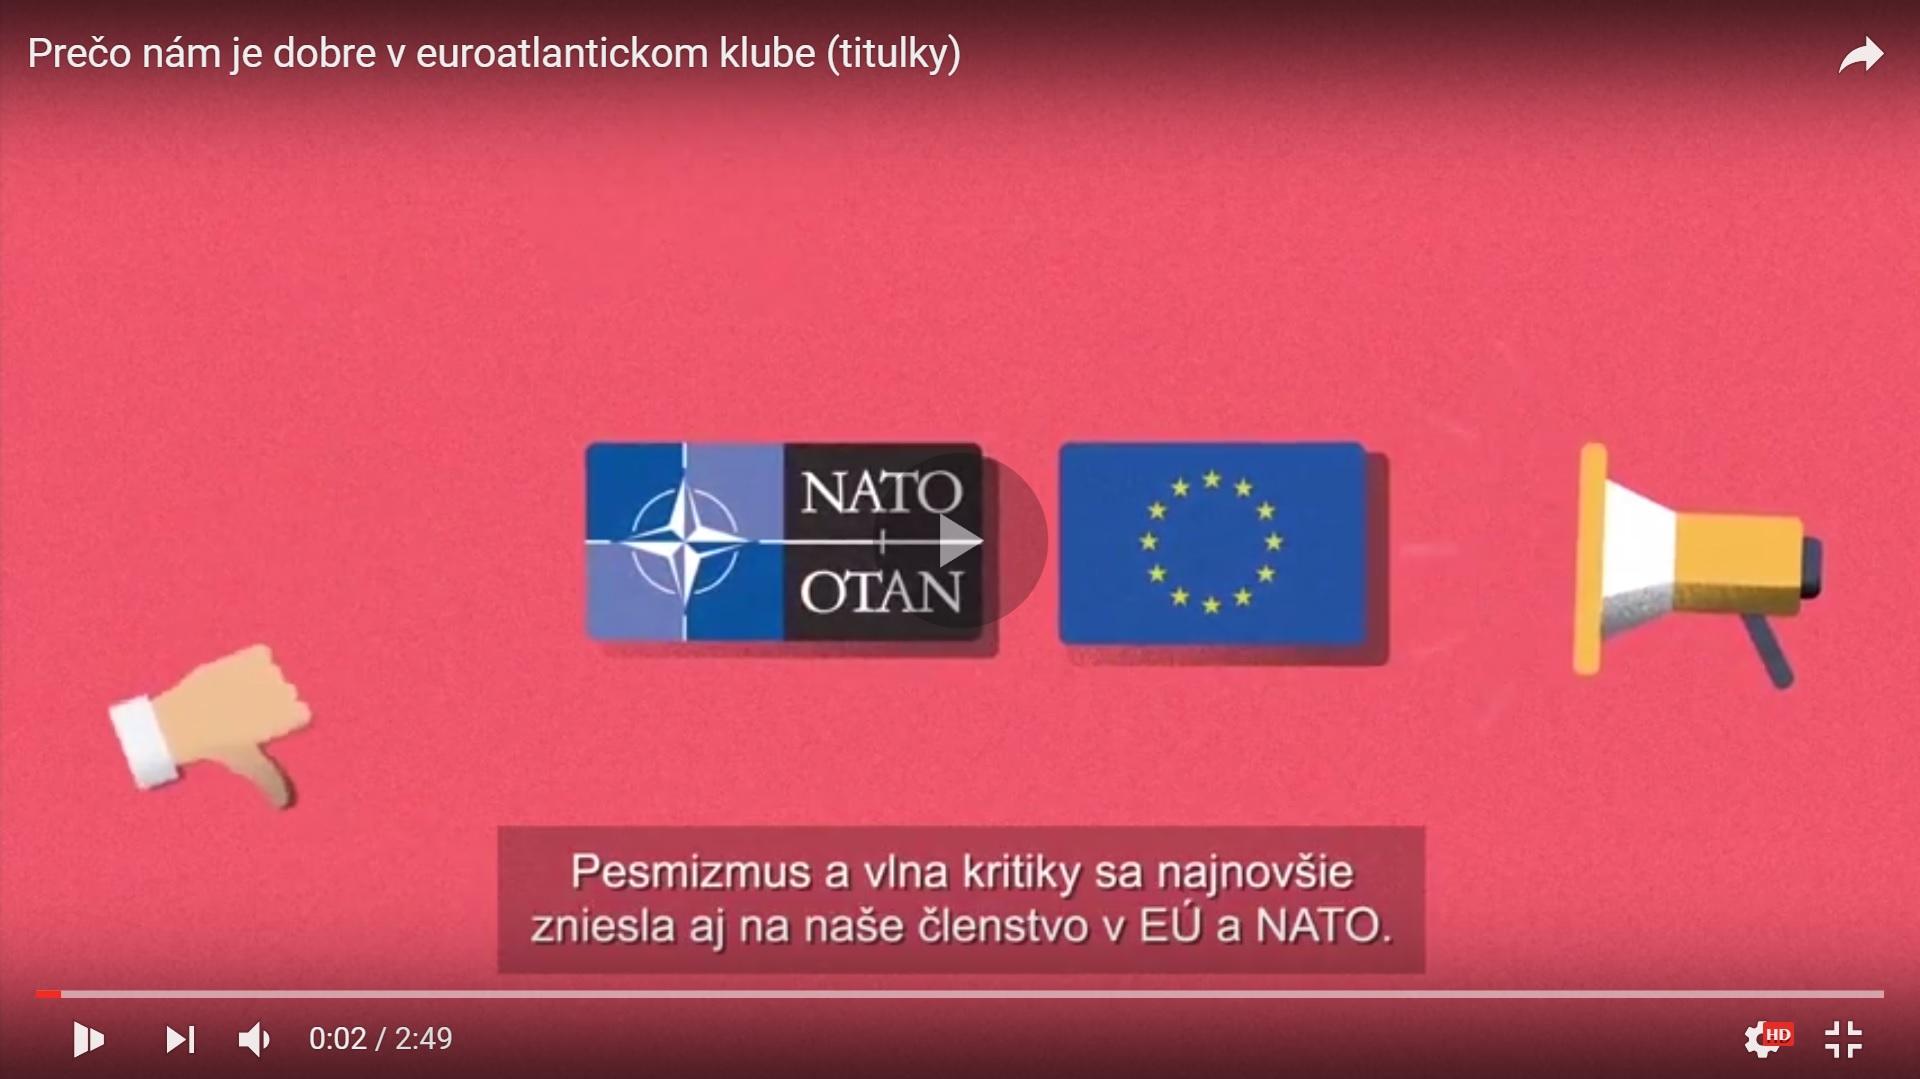 Videoexplainer: Prečo nám je dobre v euroatlantickom klube